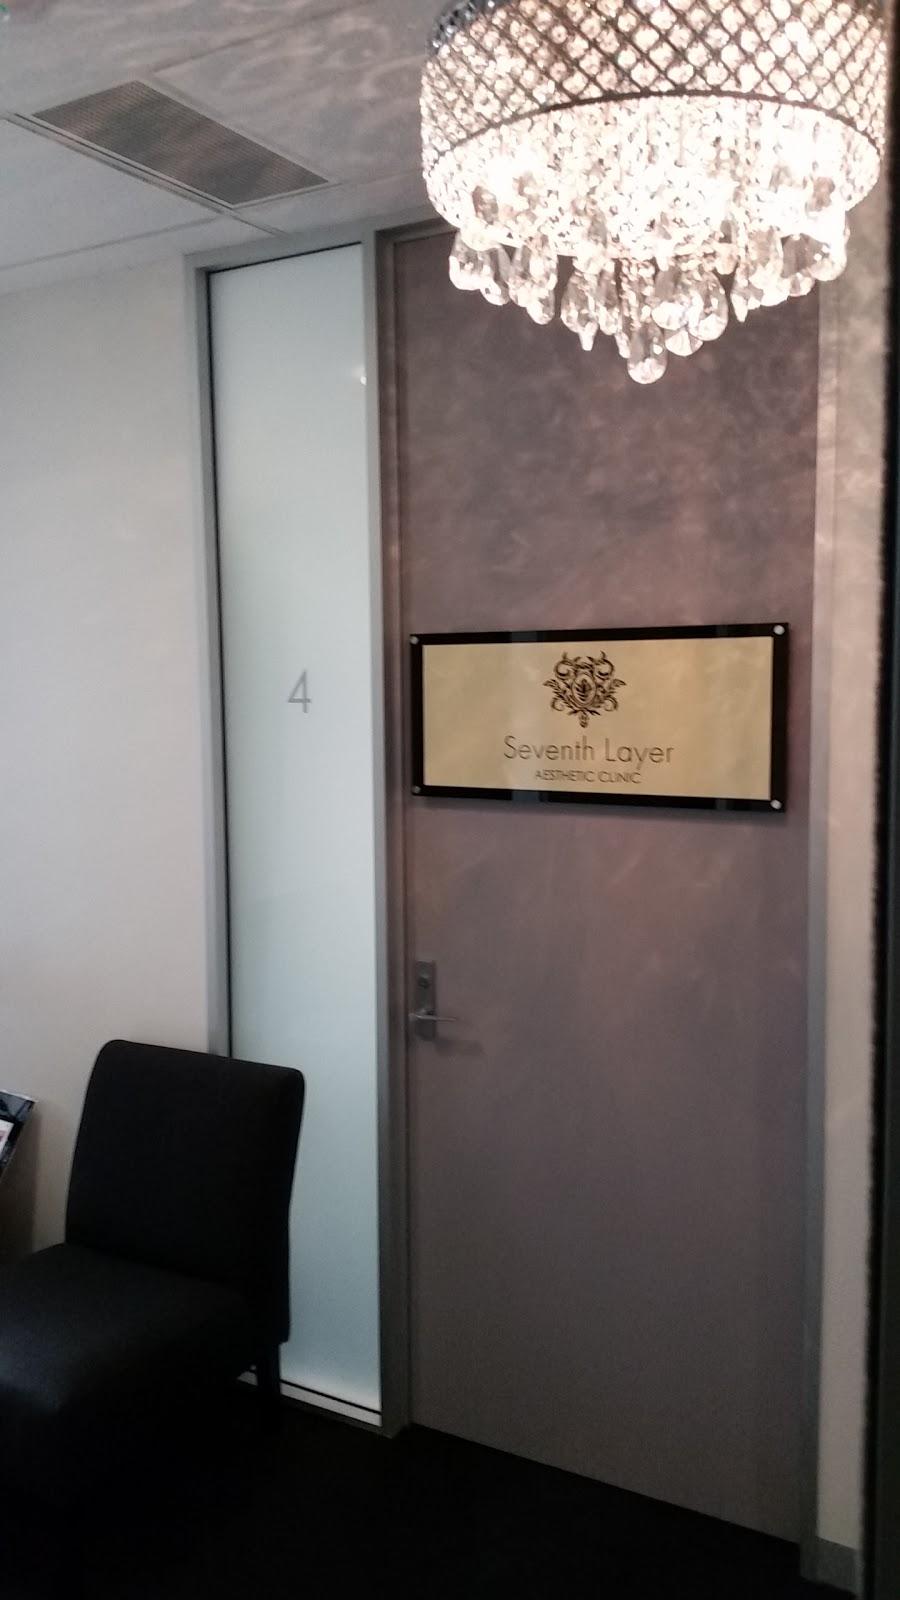 Seventh Layer Aesthetic Clinic | hair care | Level 6, Gardens Medical Centre, 470 Wodonga Pl, Albury NSW 2640, Australia | 0407586731 OR +61 407 586 731